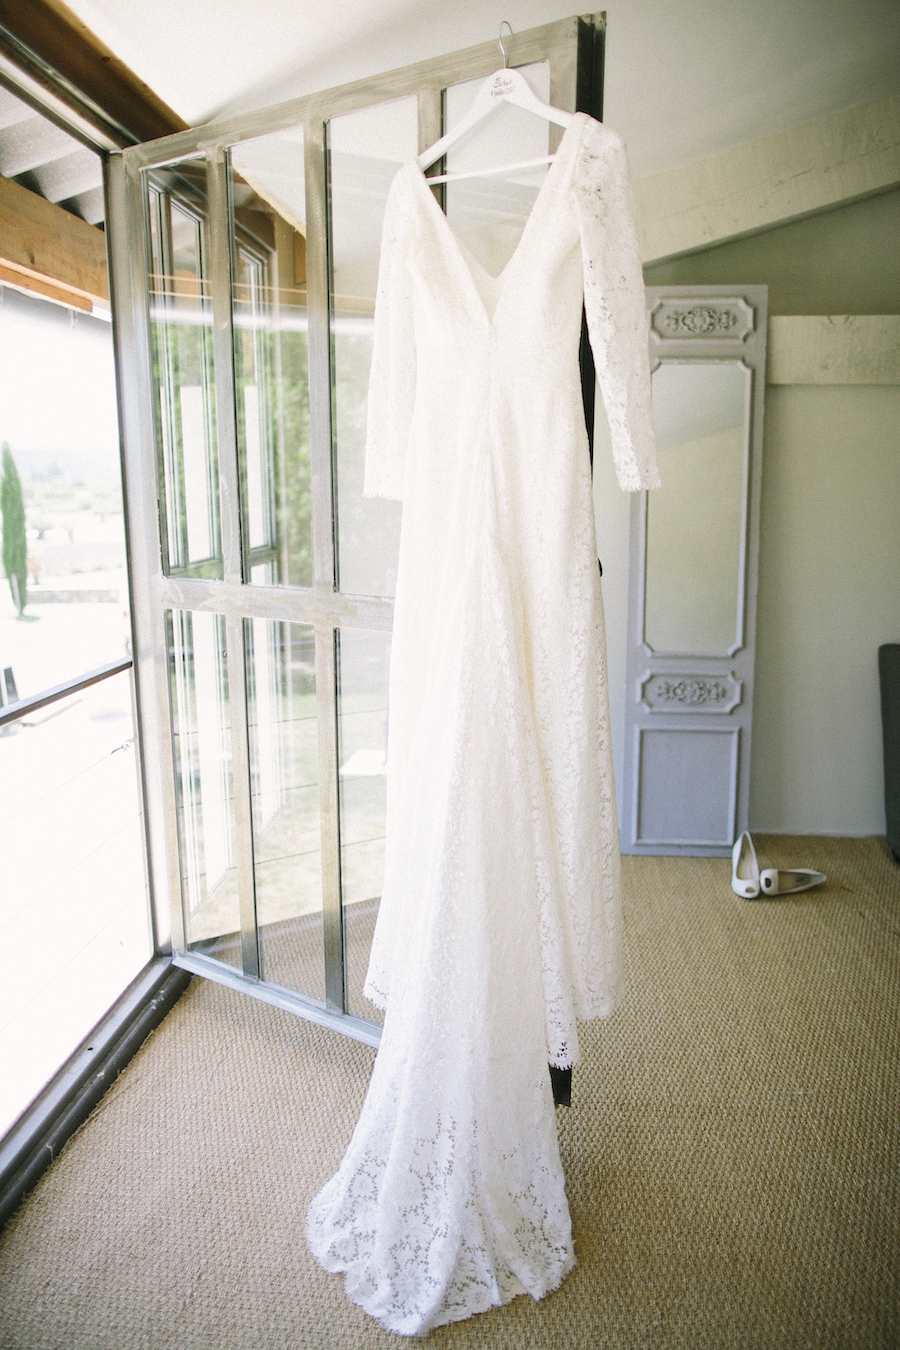 saya-photography-rustic-french-wedding-provence-domaines-de-patras-46.jpg